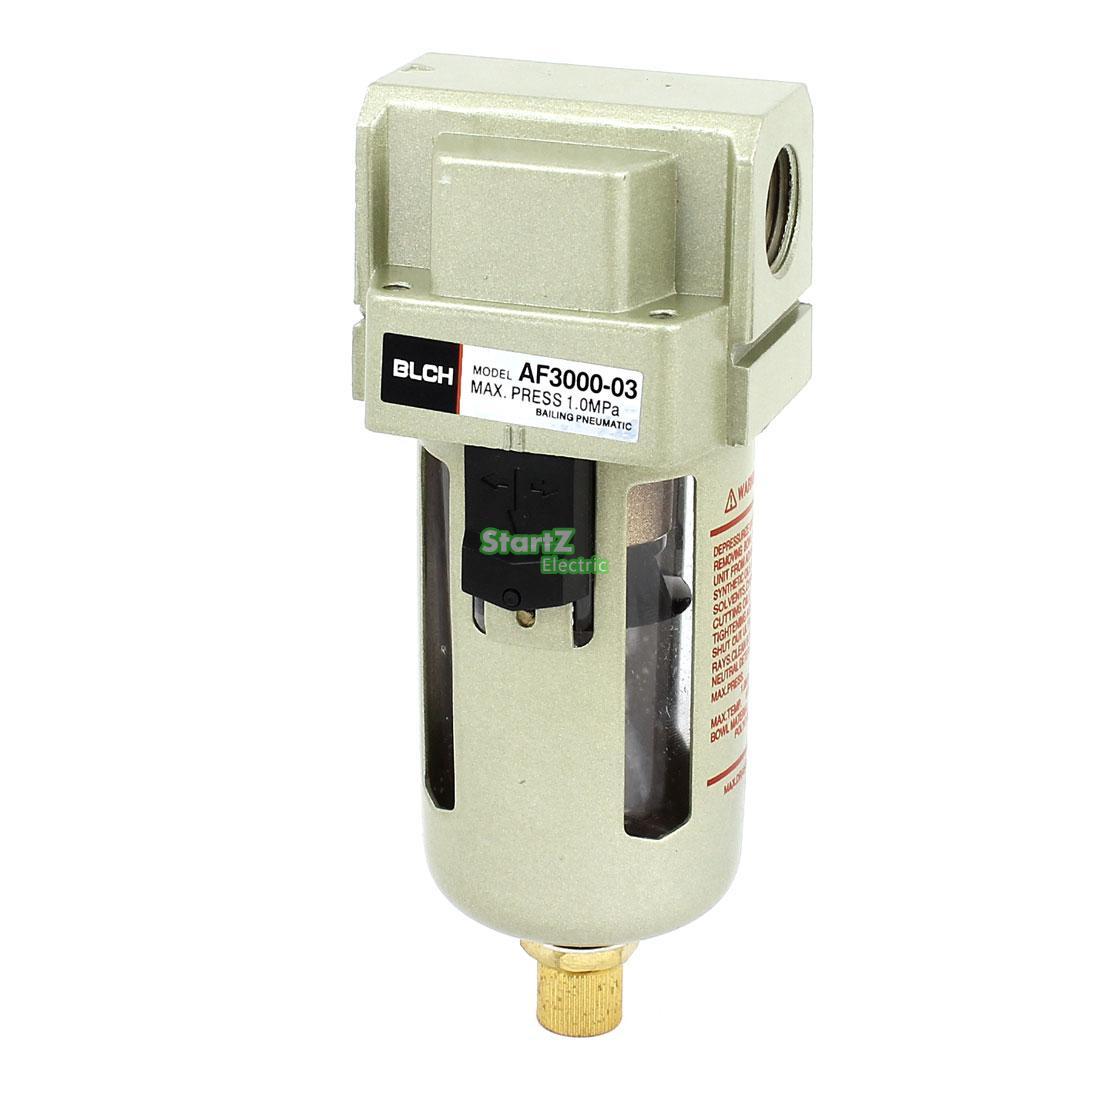 G3/8,Air Source Treatment Unit SMC type Automatic Drain type pneumatic air filter regulator aw3000 03d 3 8 smc type air treatment unit automatic drain type